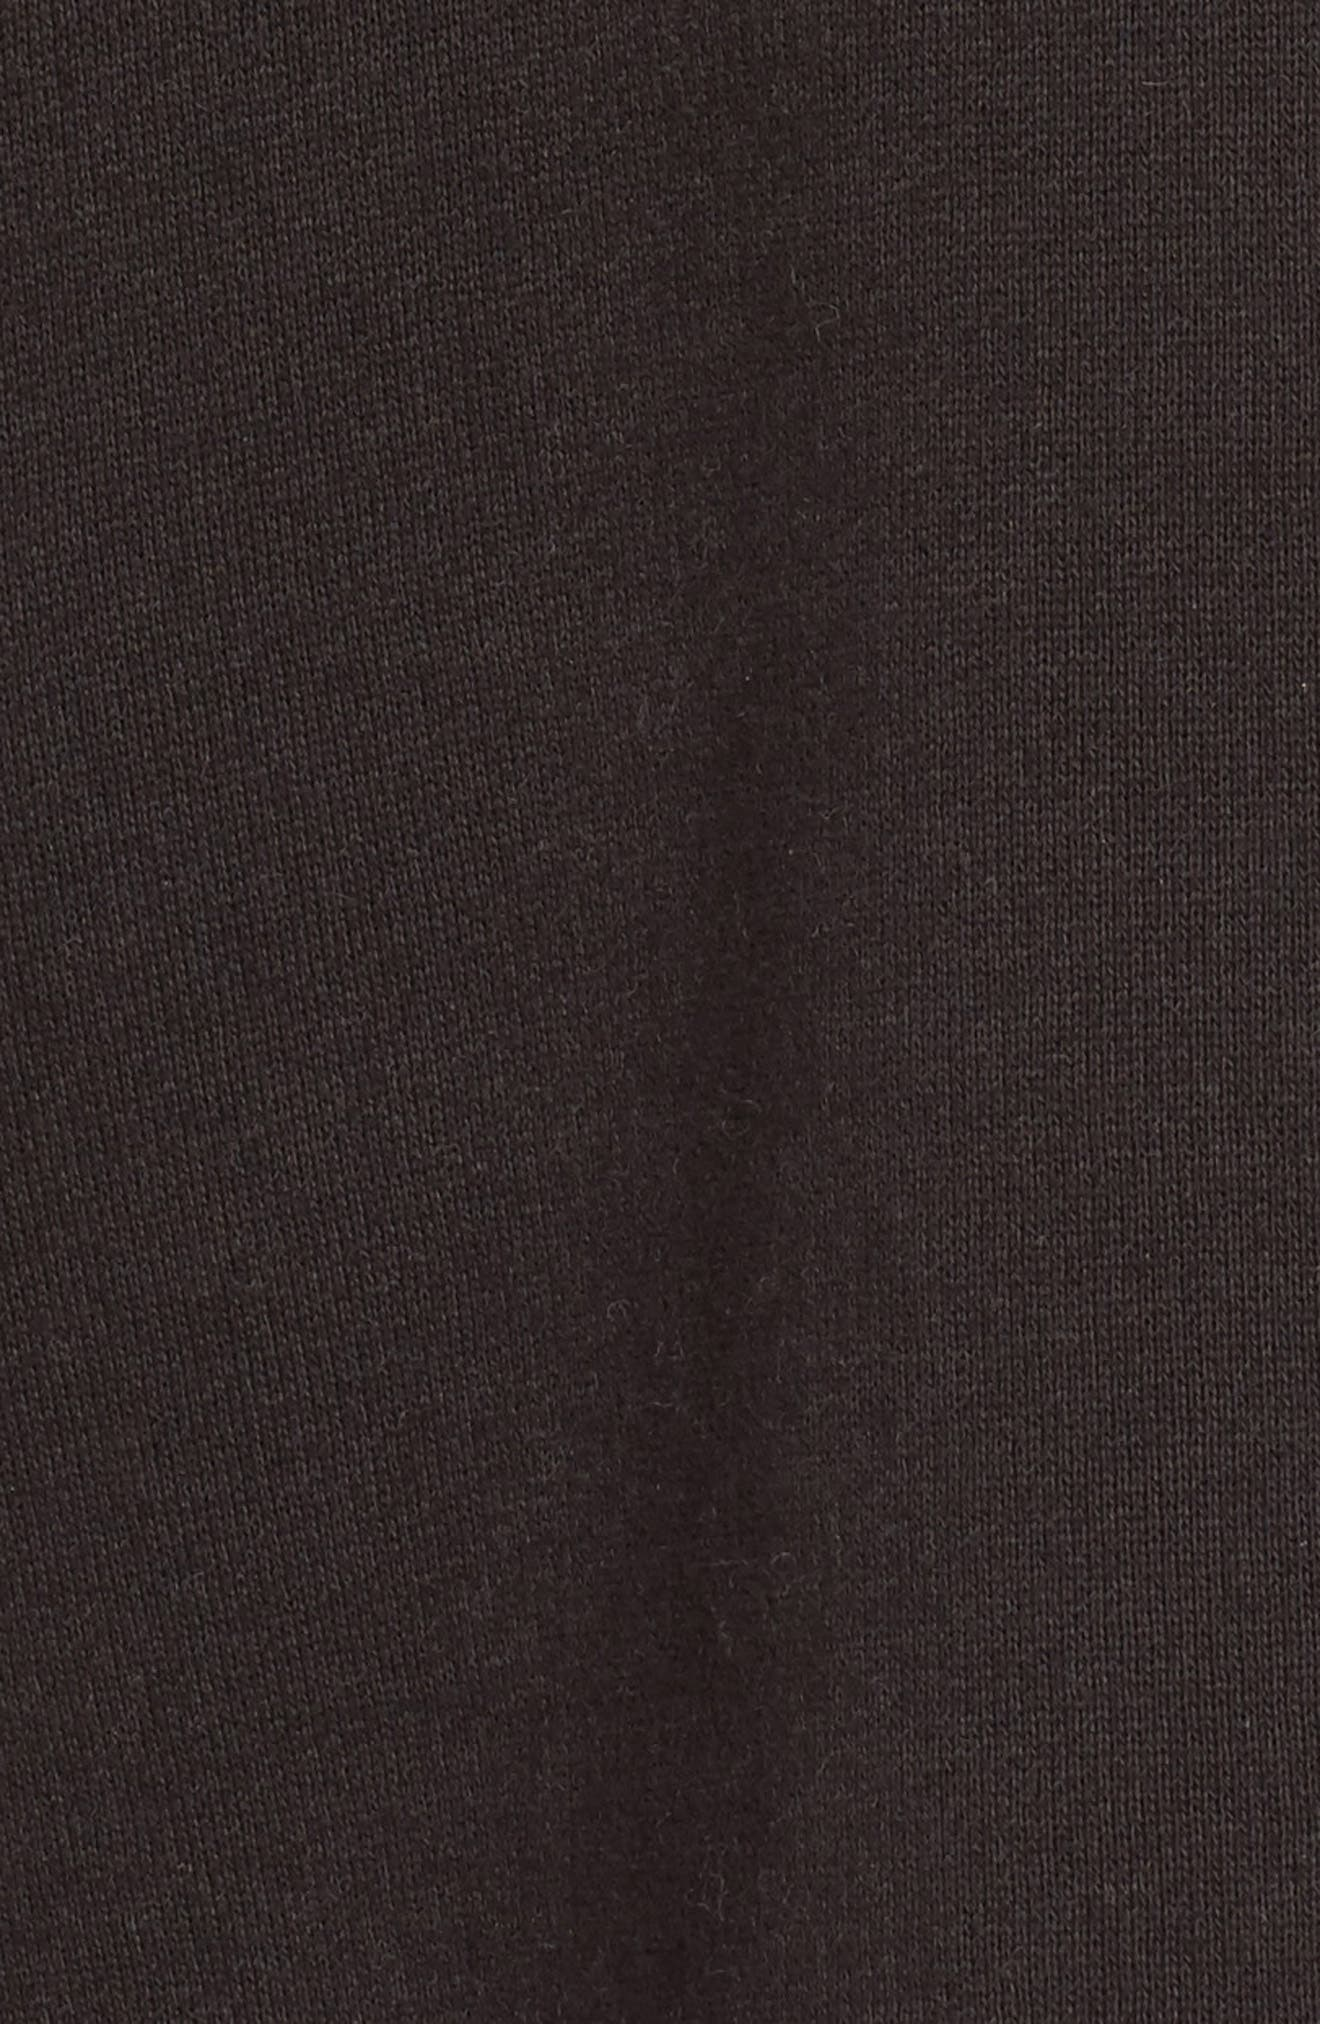 Fleece Lined Hoodie,                             Alternate thumbnail 5, color,                             024